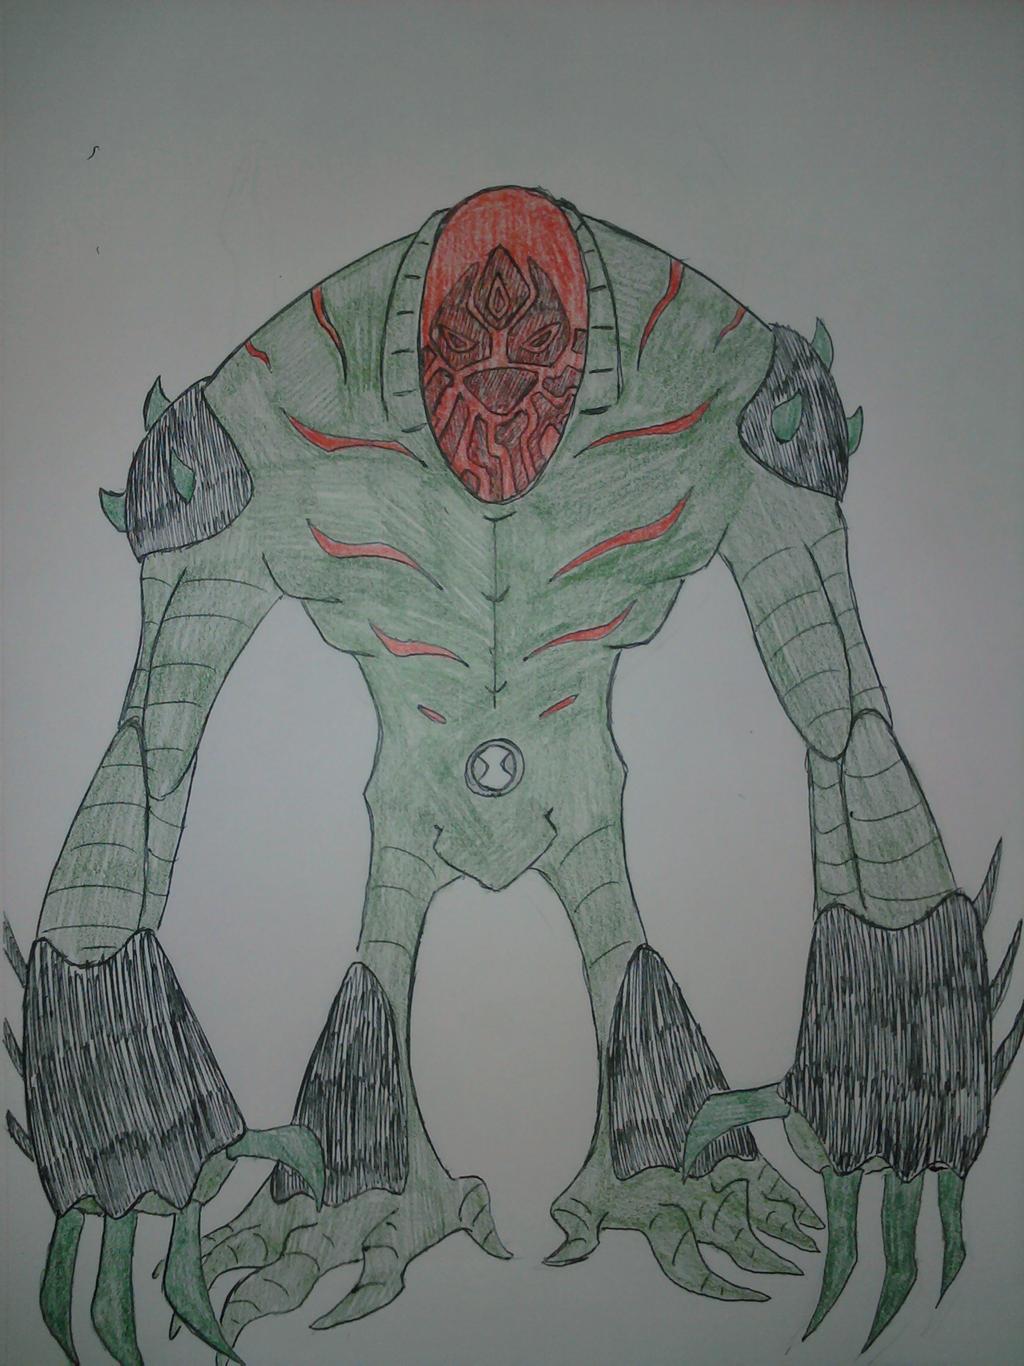 Swampfire by Zigwolf